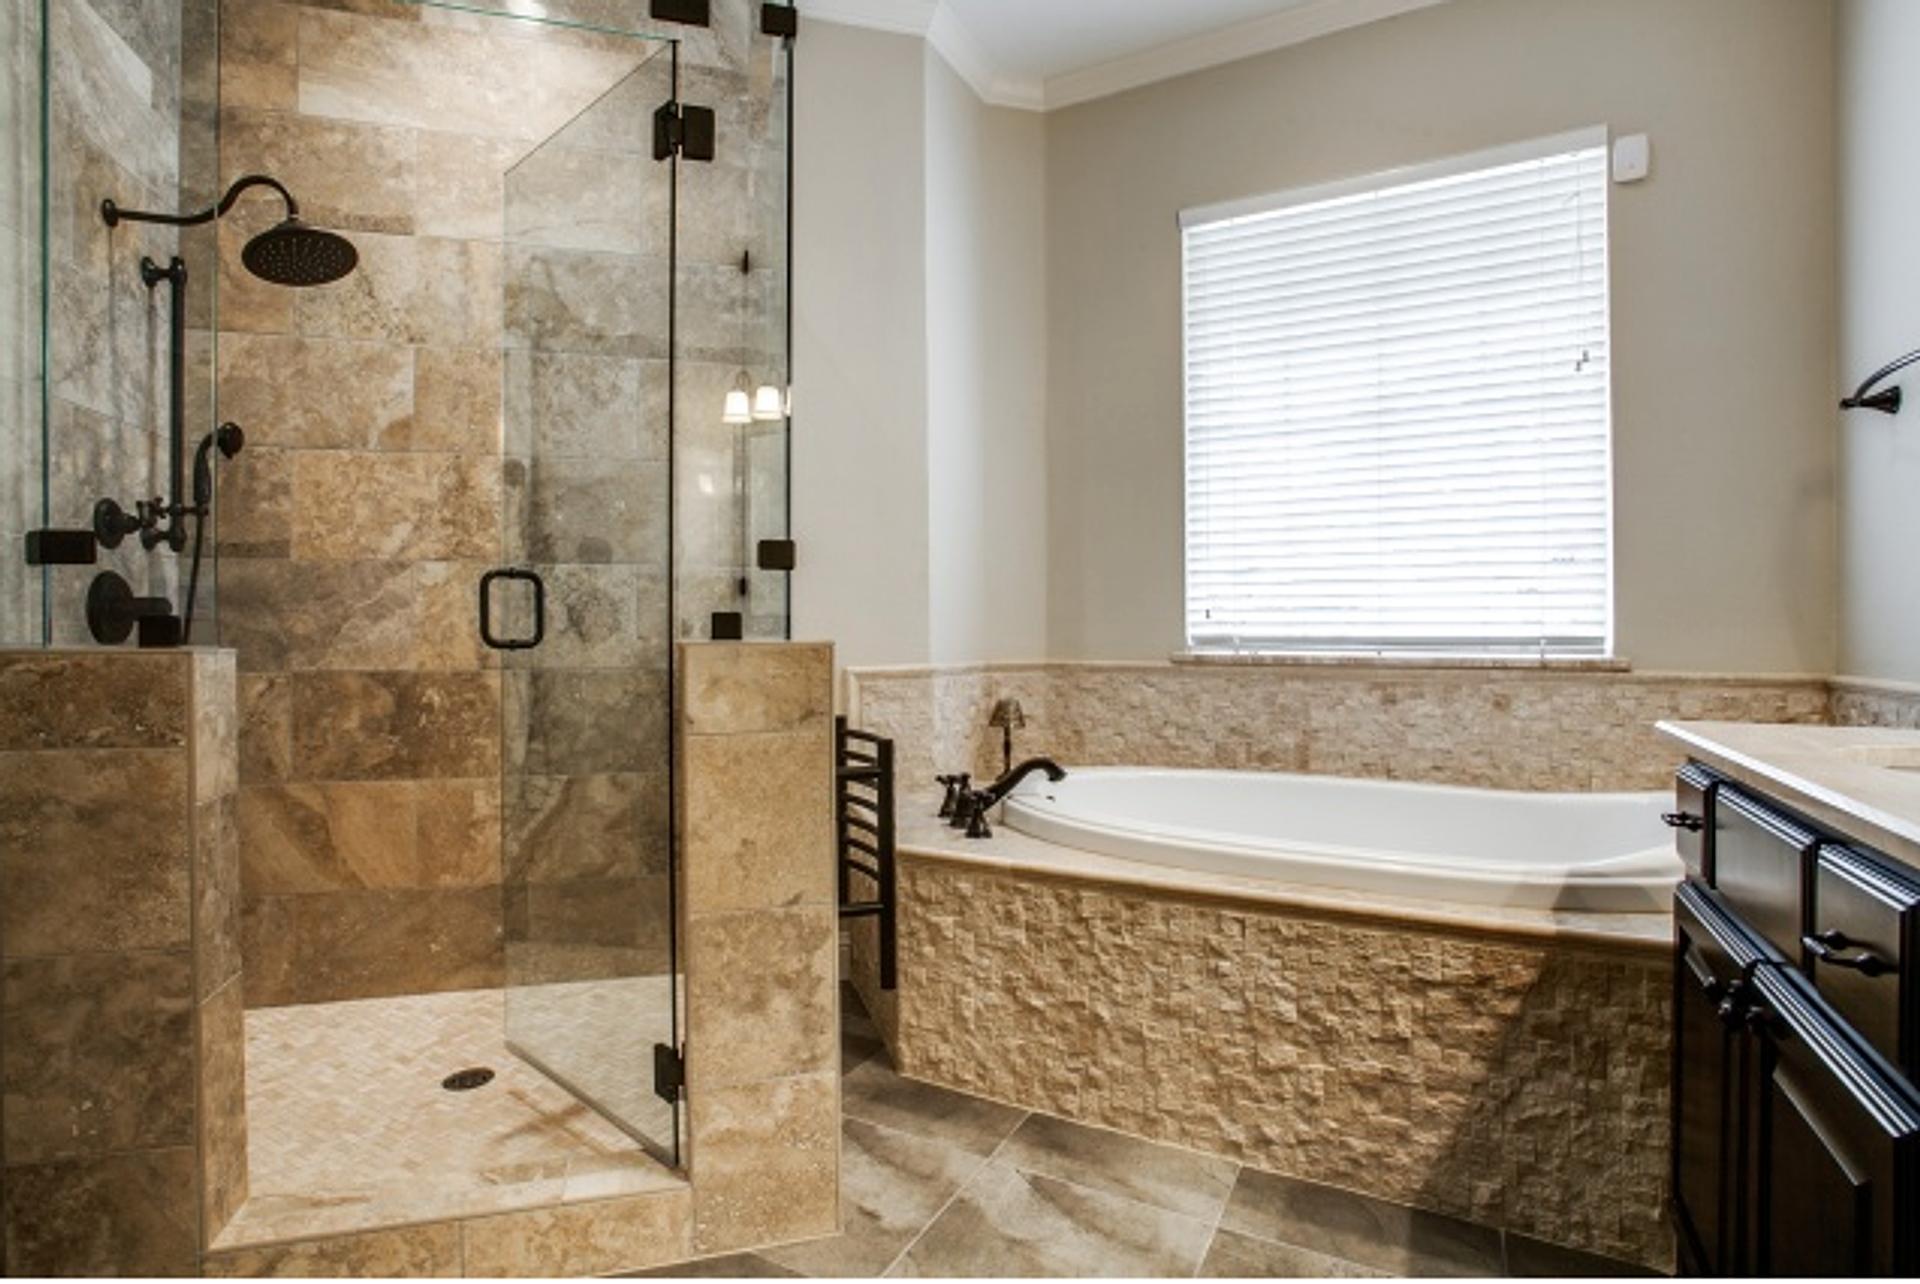 bathroom remodel fairfax - Bathroom Remodeling Fairfax Va